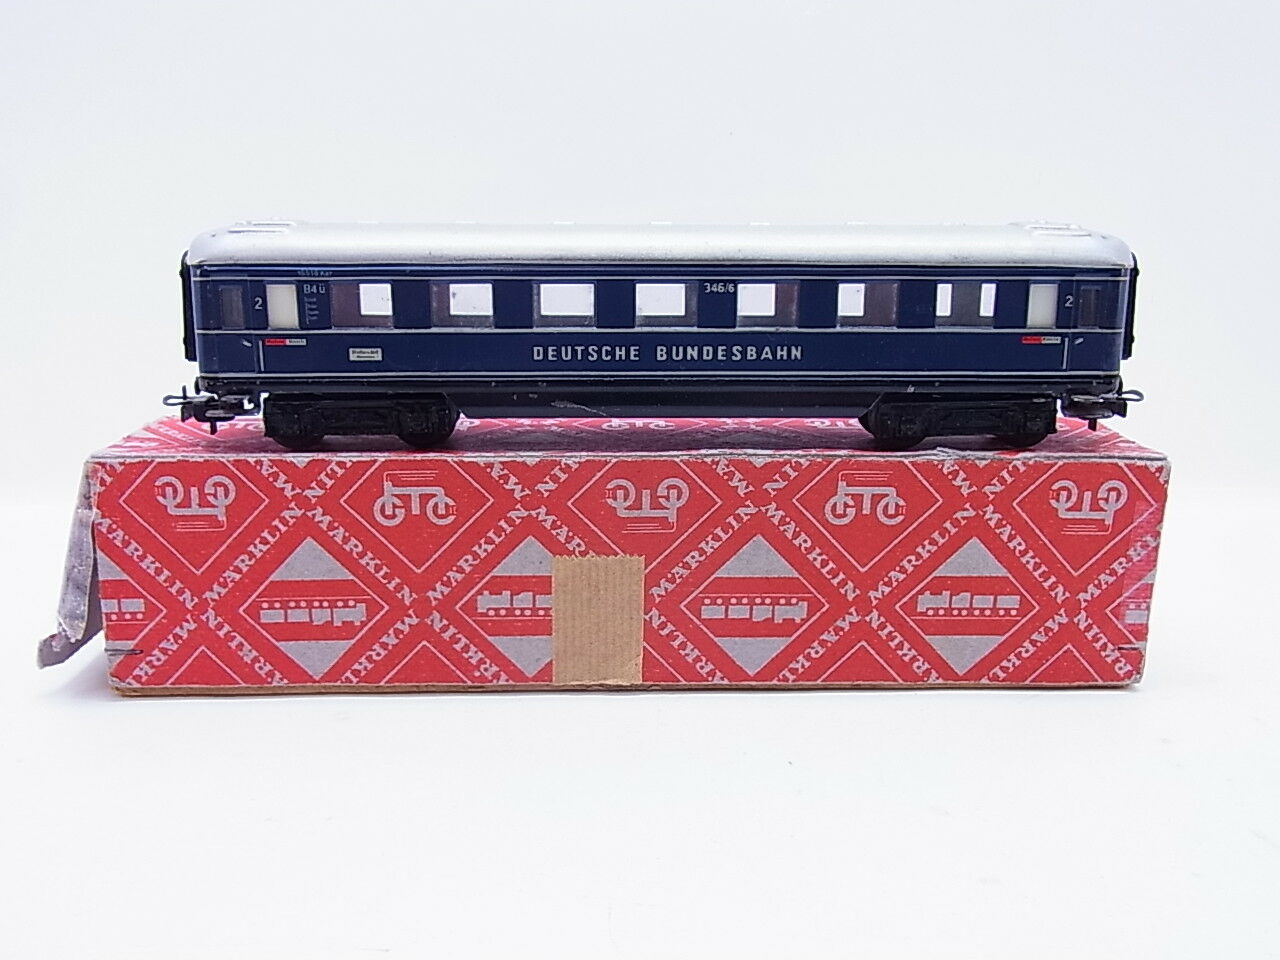 LOT 53069 |   H0 346/6 FD-Zugwagen 2. Klasse der DB Blech in Rautenkarton